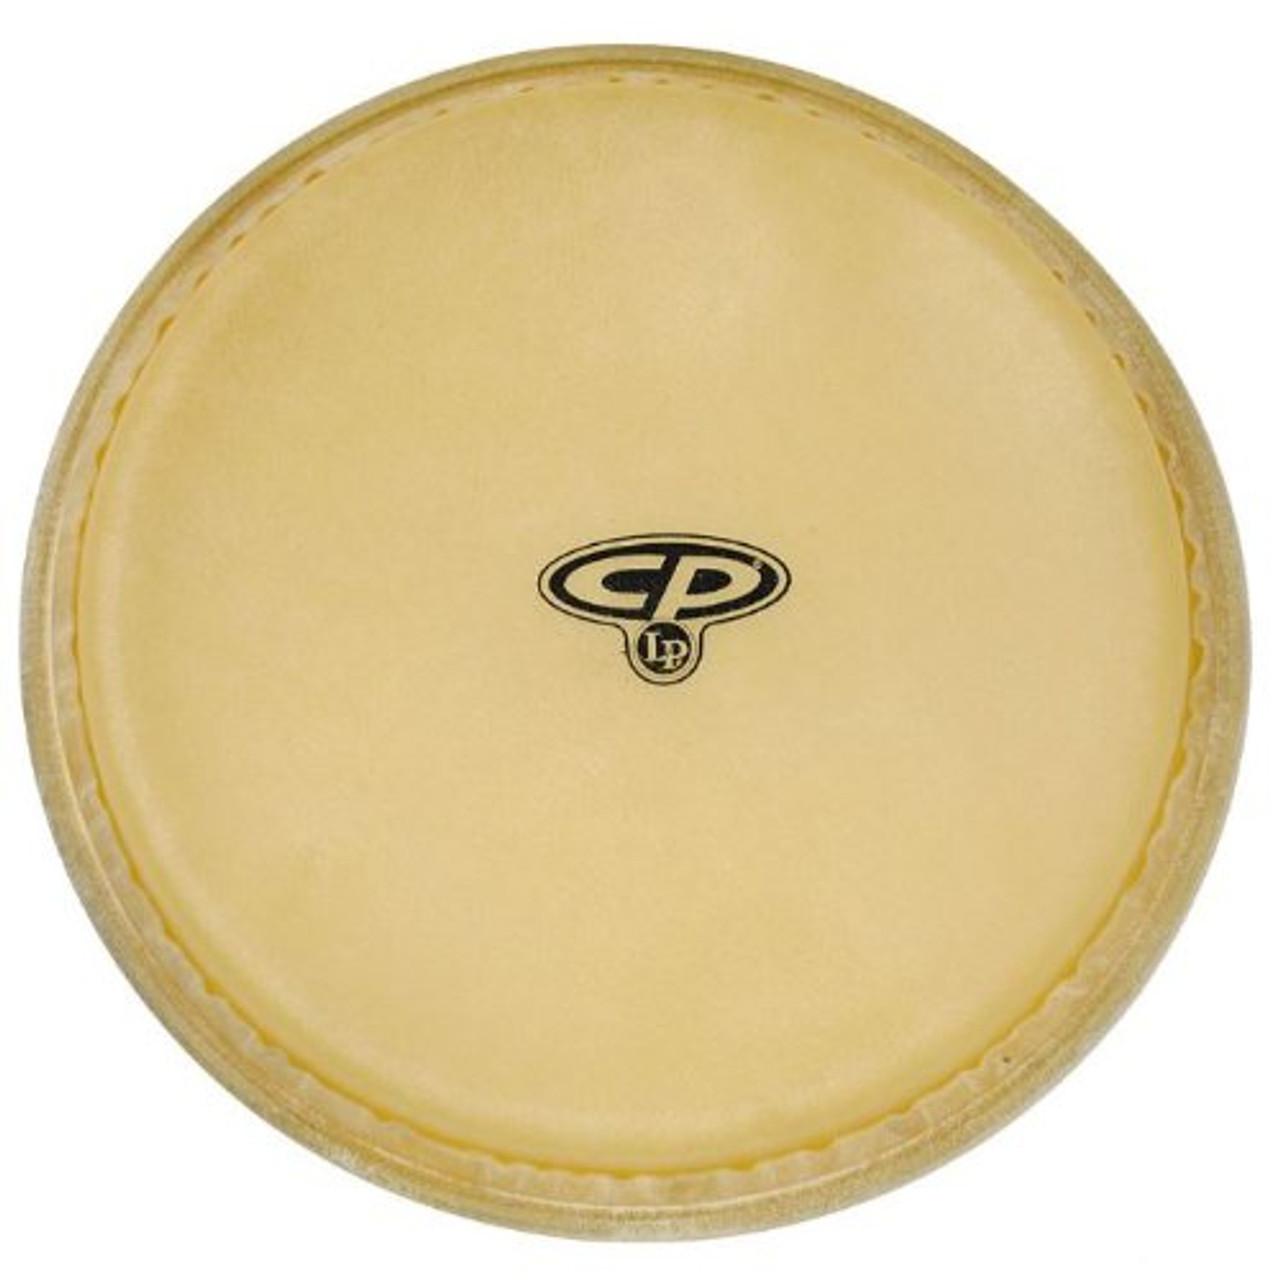 Drum Workshop 10 Inreplcmnt Head for Cp636-Wrb